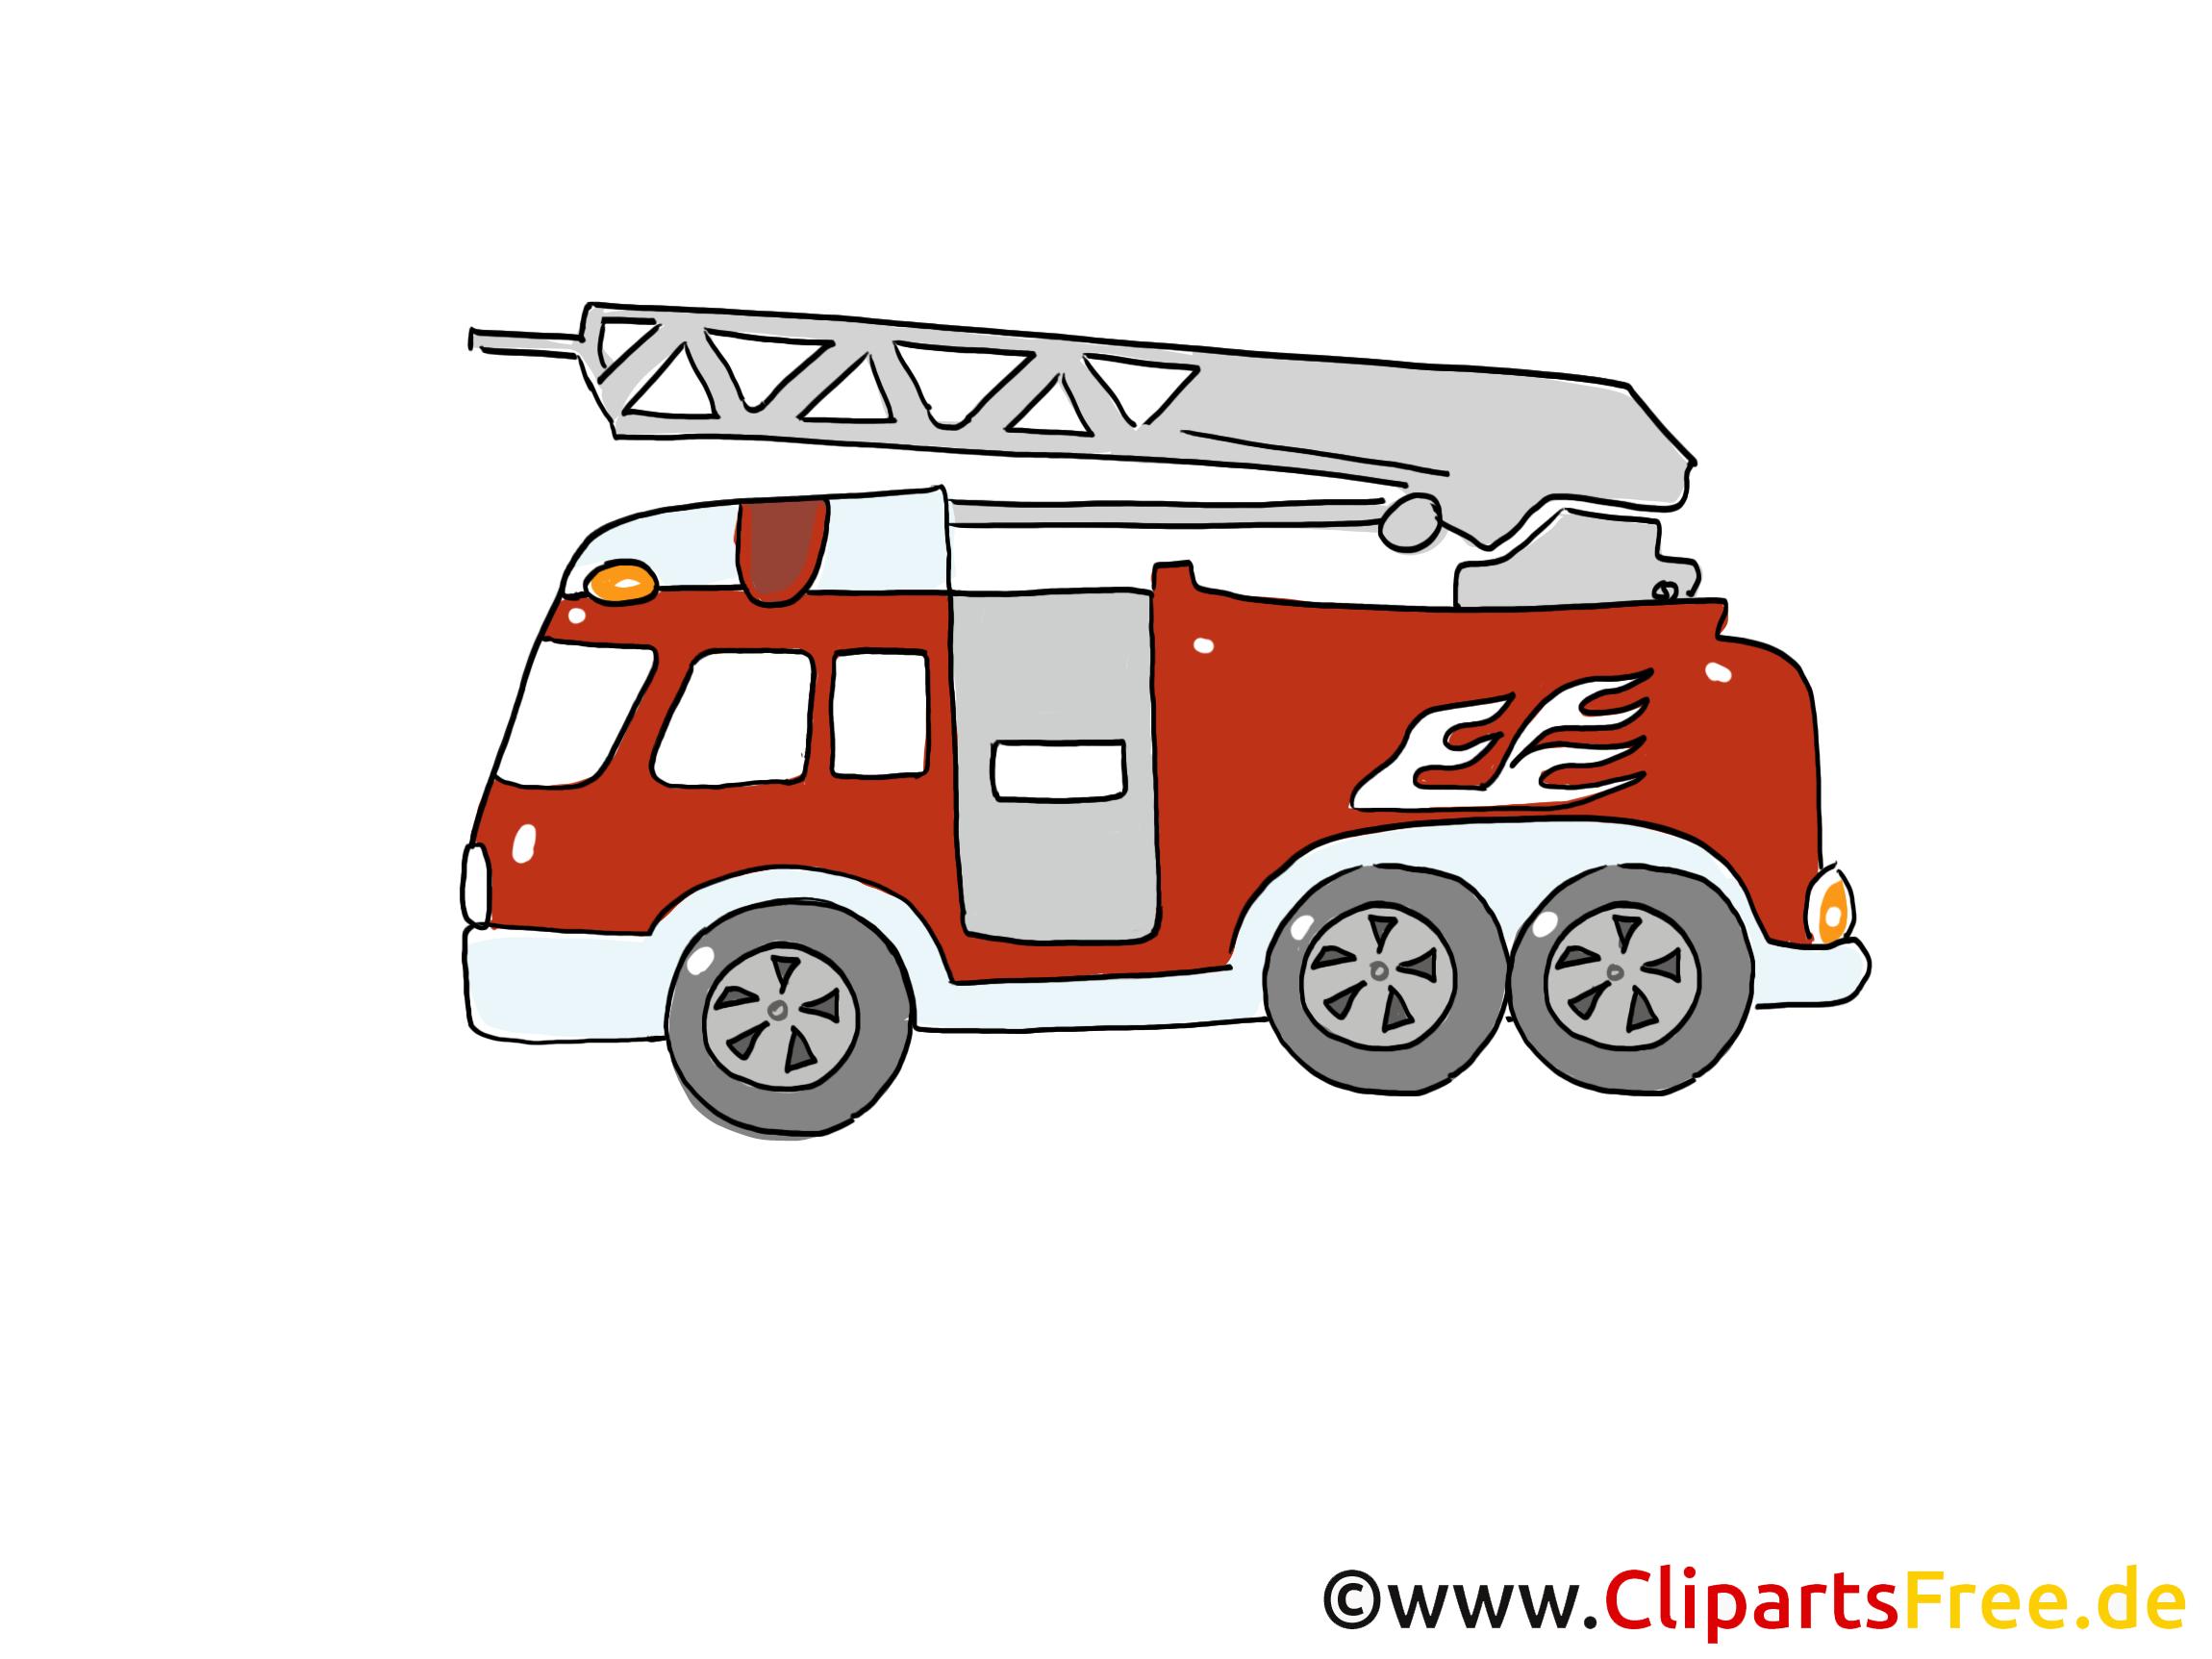 voiture de pompier image gratuite illustration voitures dessin picture image graphic clip. Black Bedroom Furniture Sets. Home Design Ideas